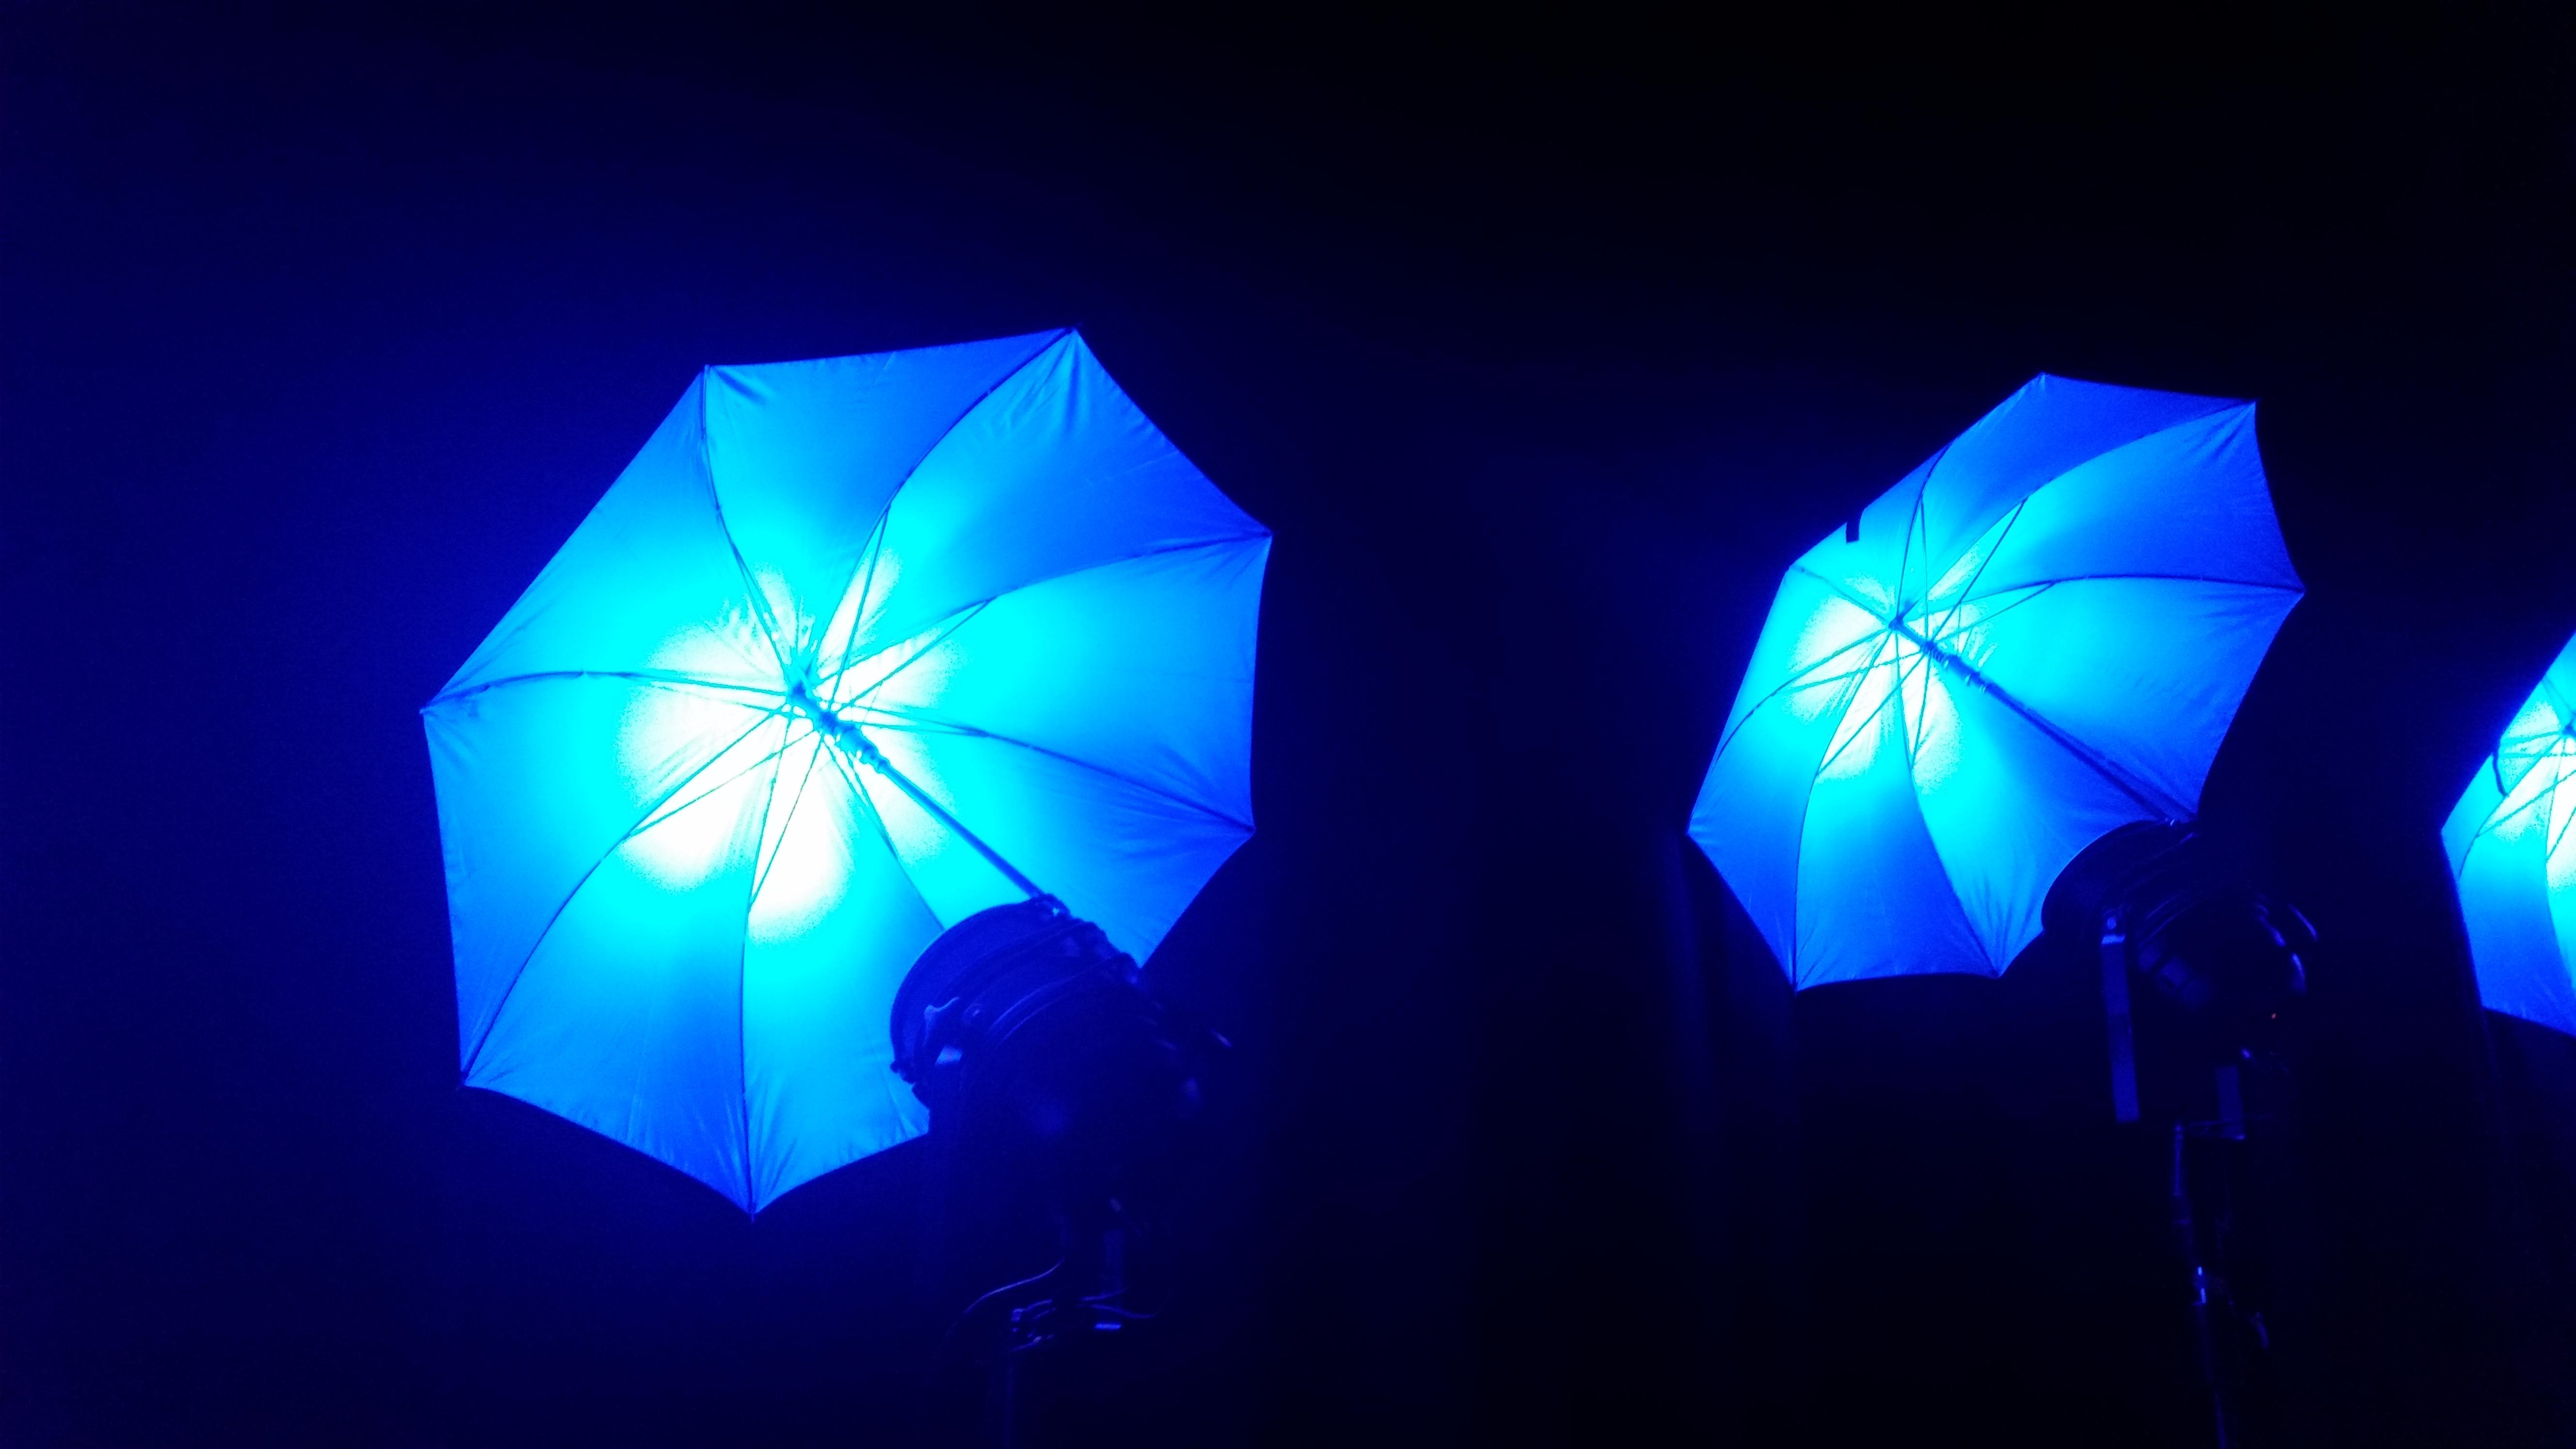 Neue LED Schirme als Designelemente 4